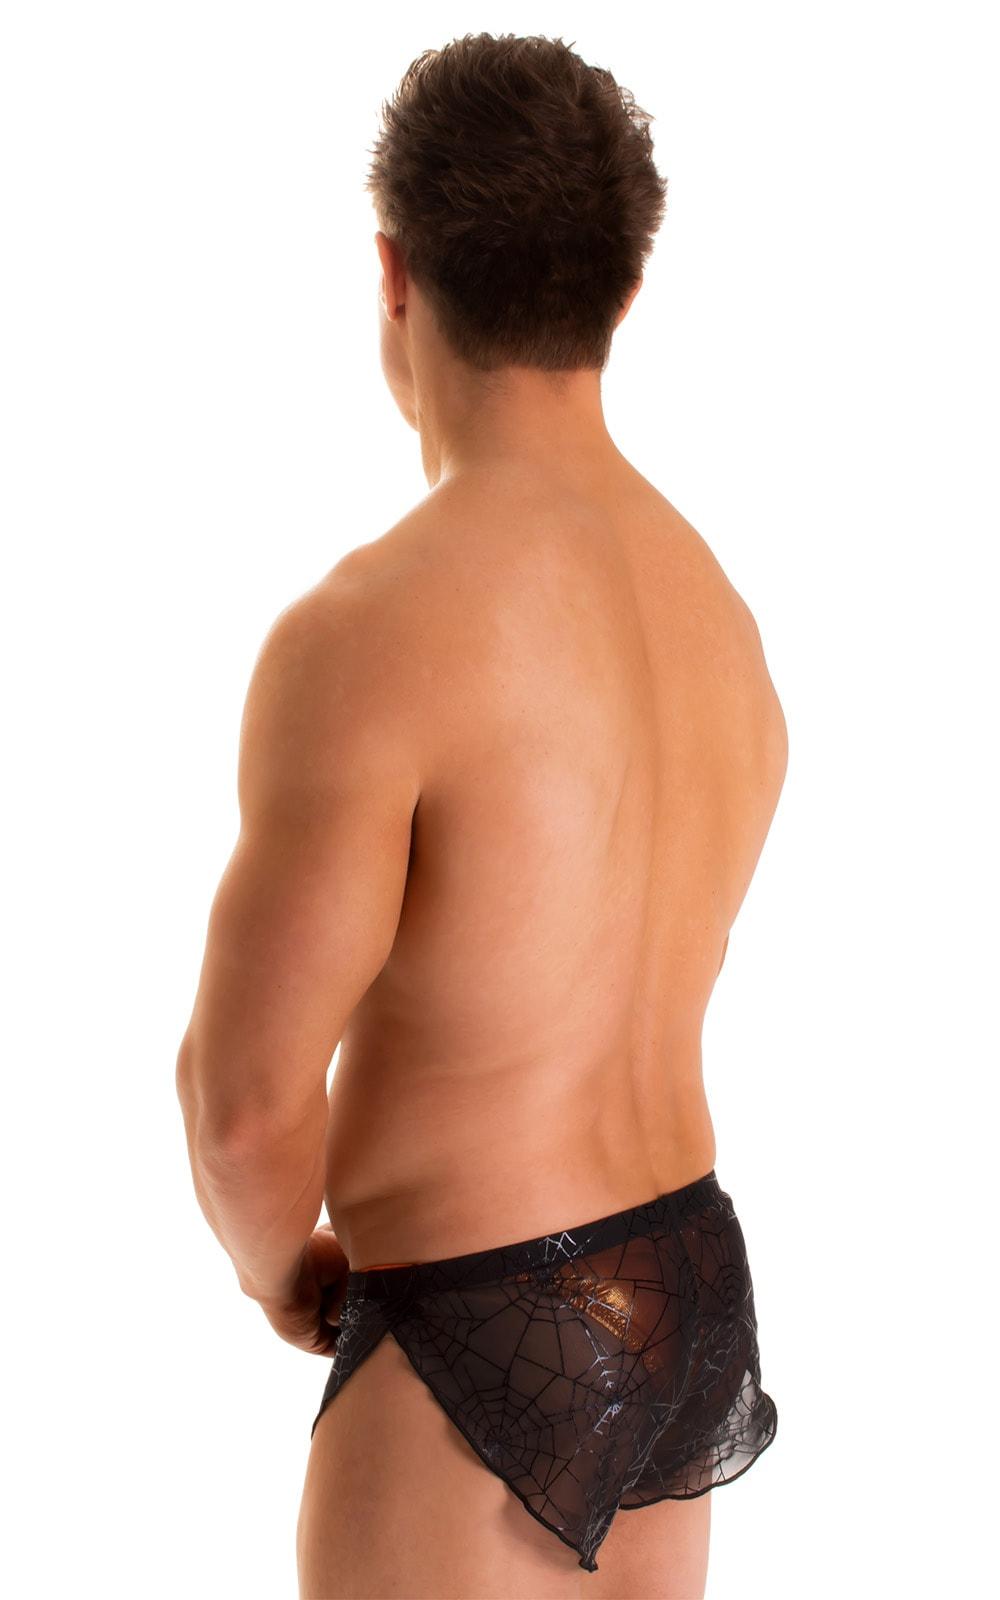 Swimsuit Cover Up Split Running Shorts in Semi Sheer Black Spiderweb mesh 2